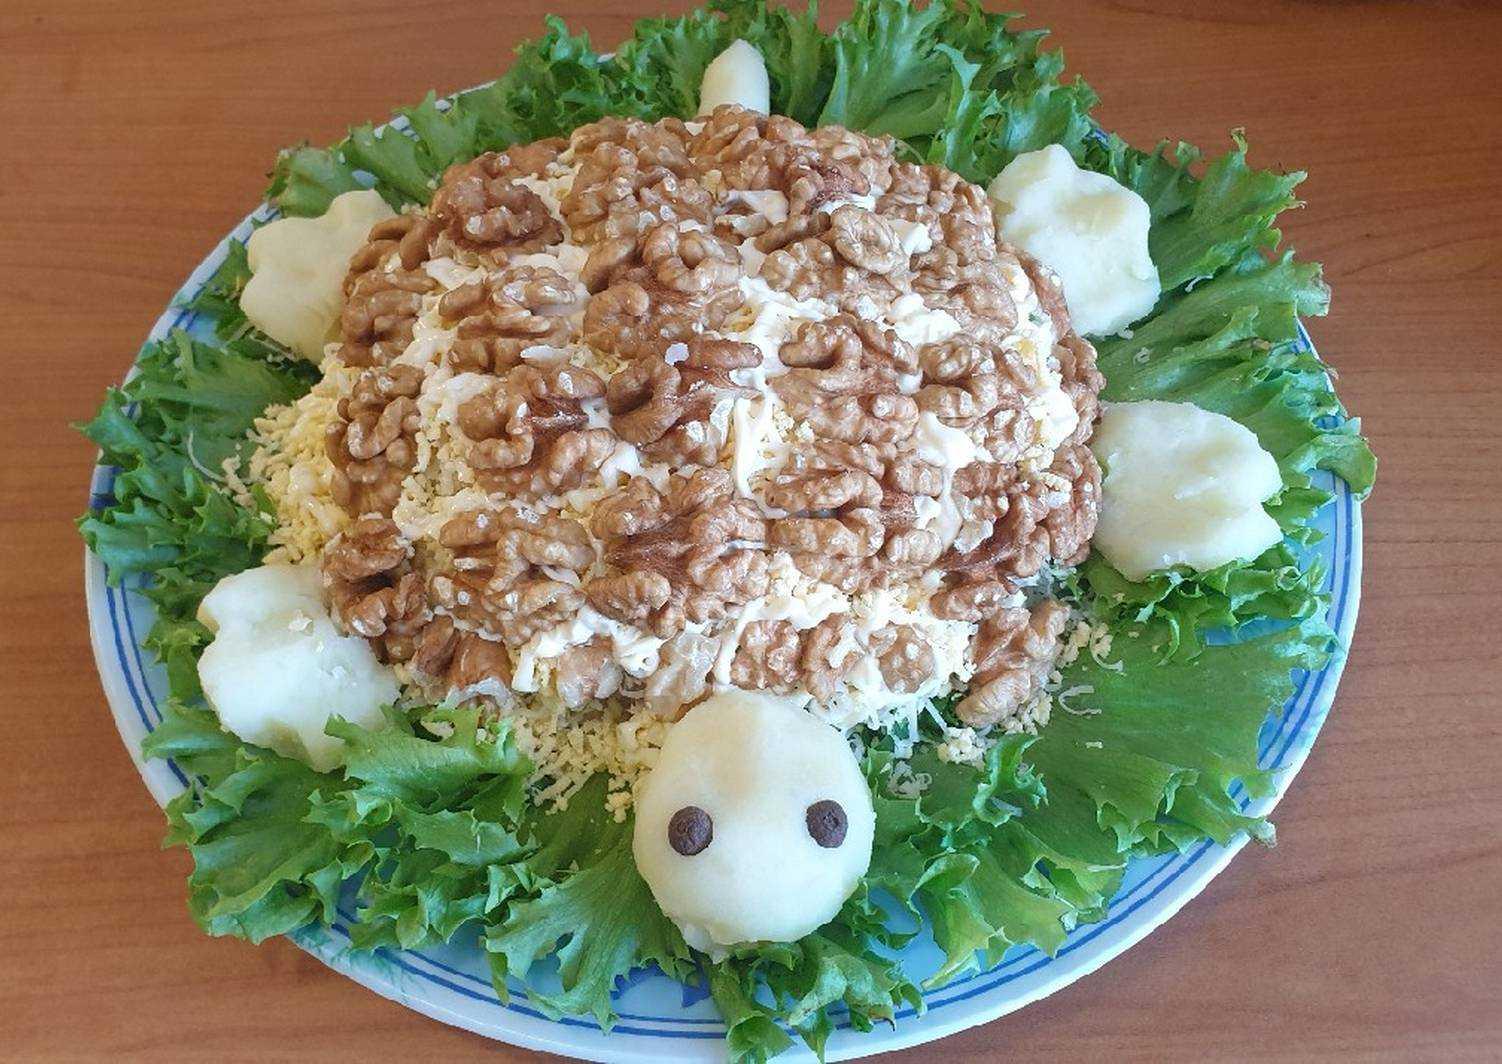 Салат черепаха с курицей и черносливом рецепт с фото - 1000.menu